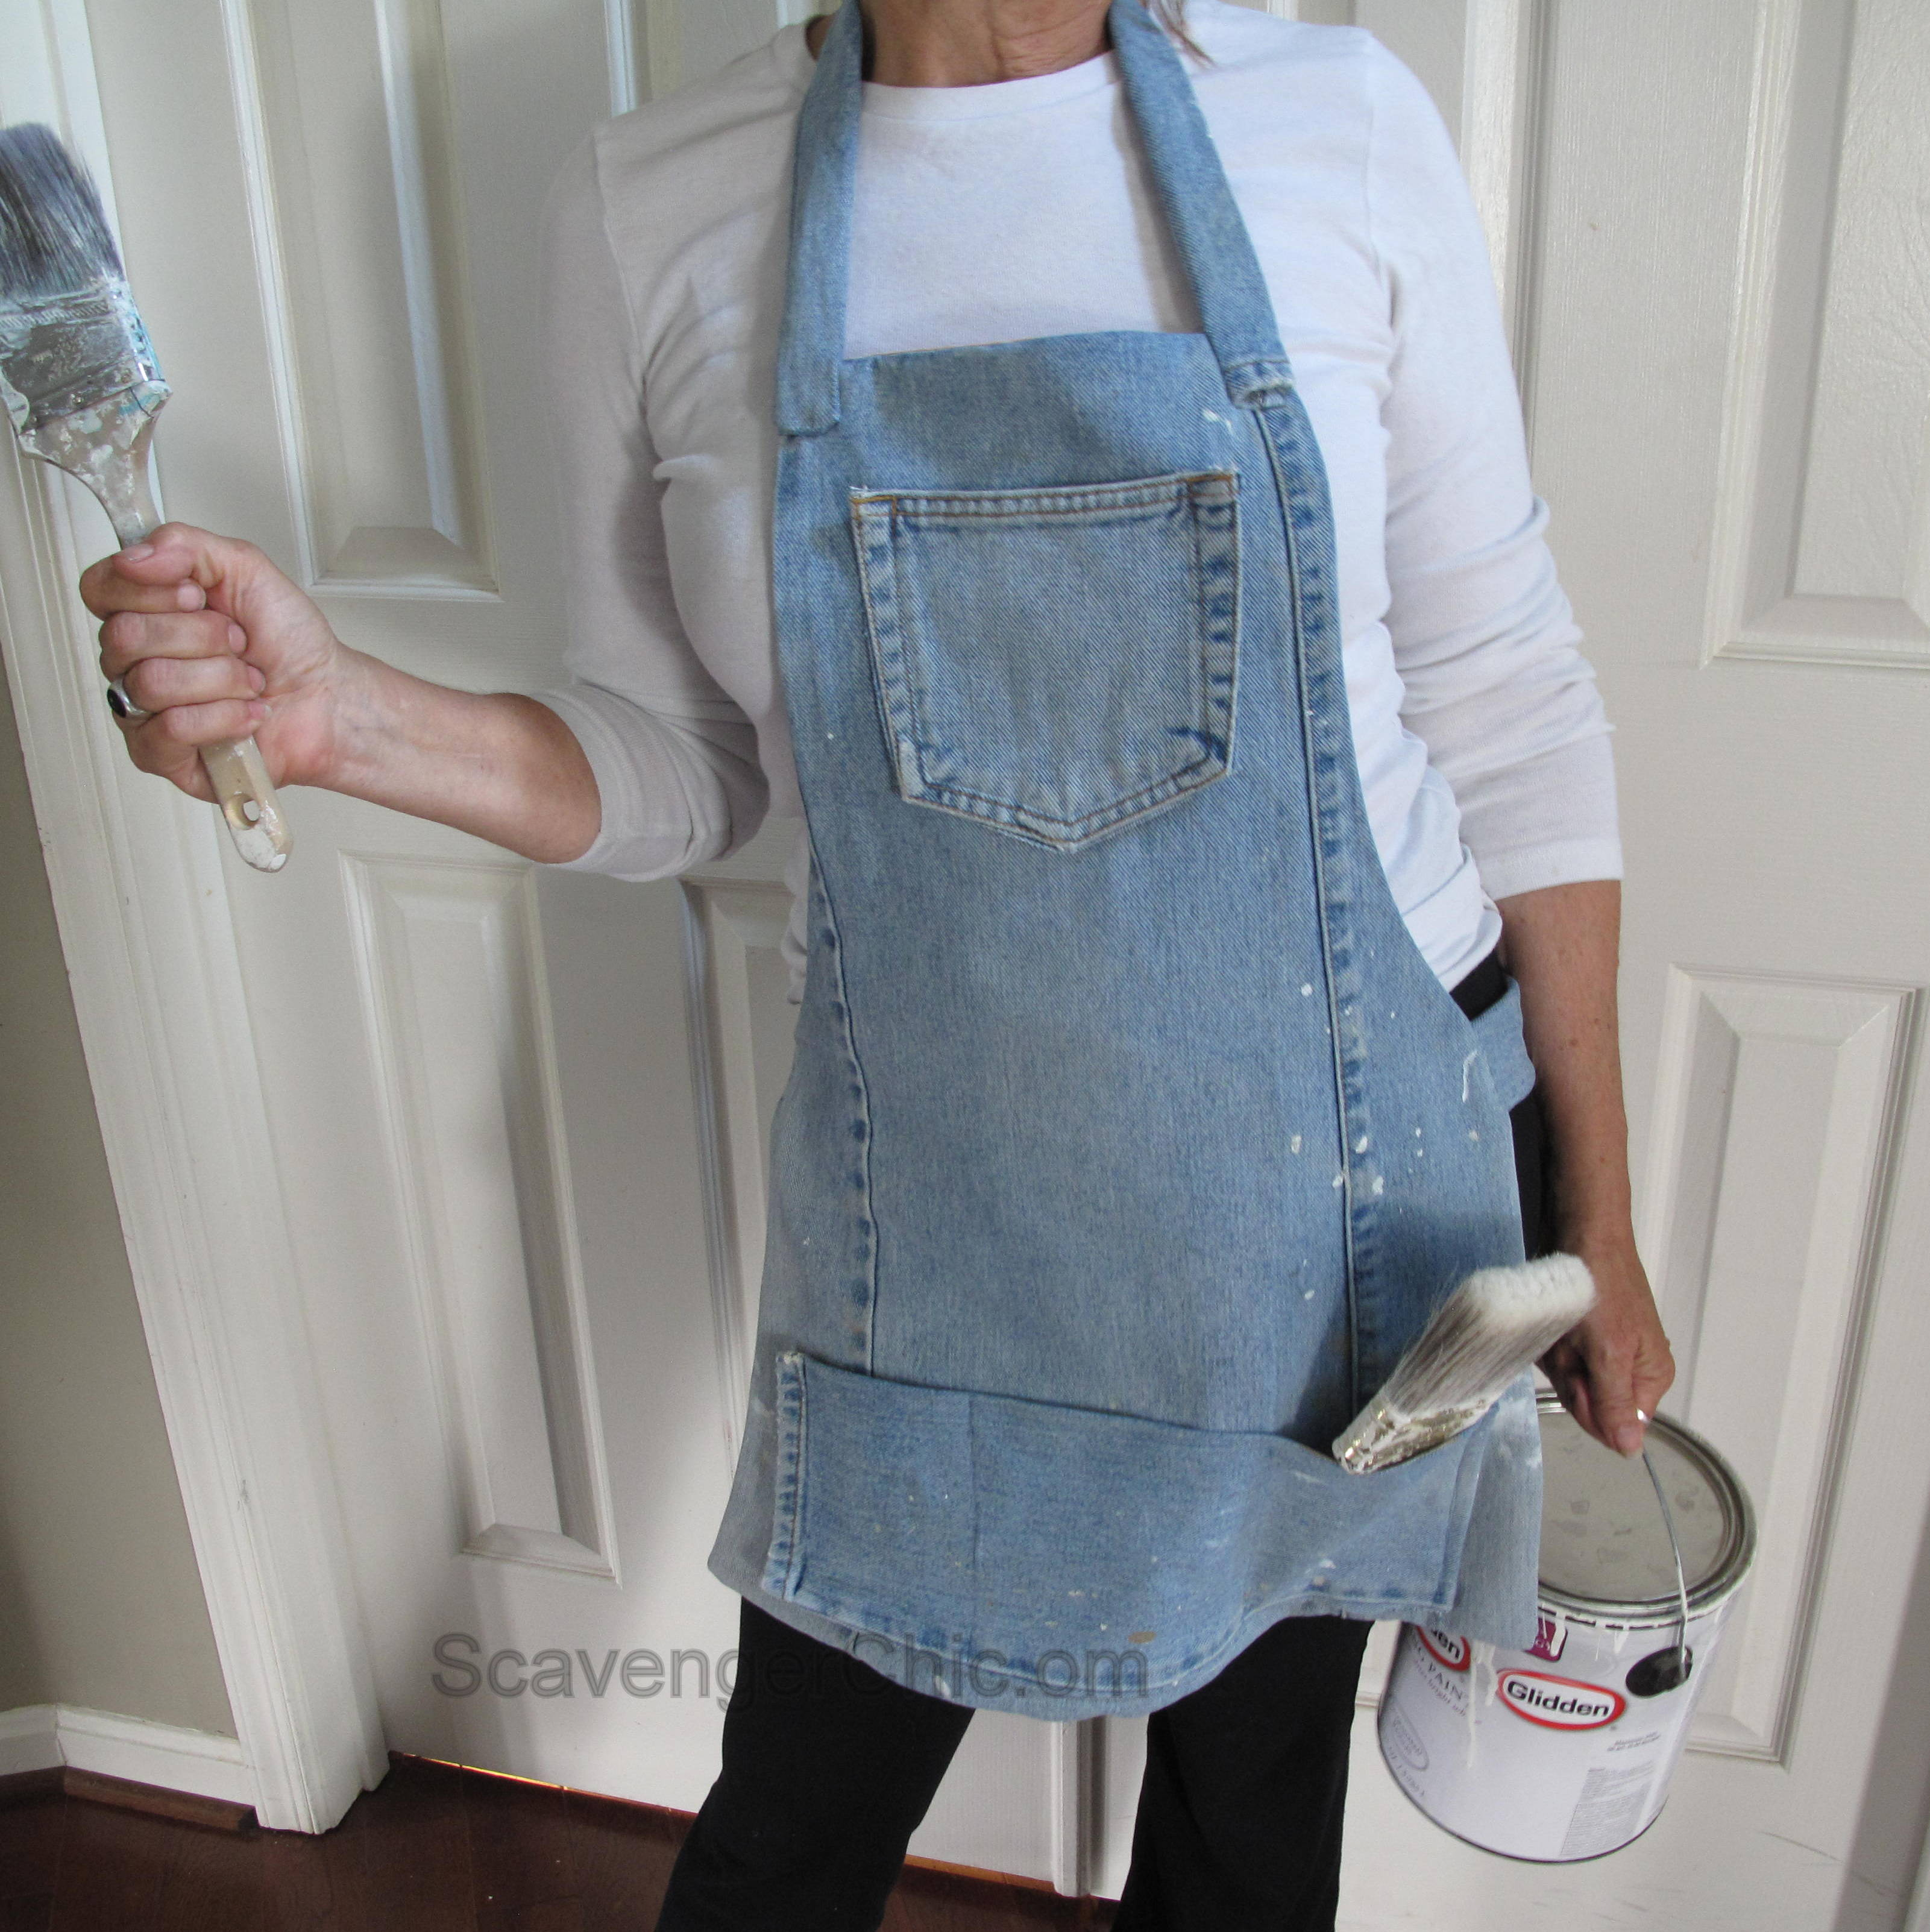 Blue apron how to recycle - Blue Apron How To Recycle 32